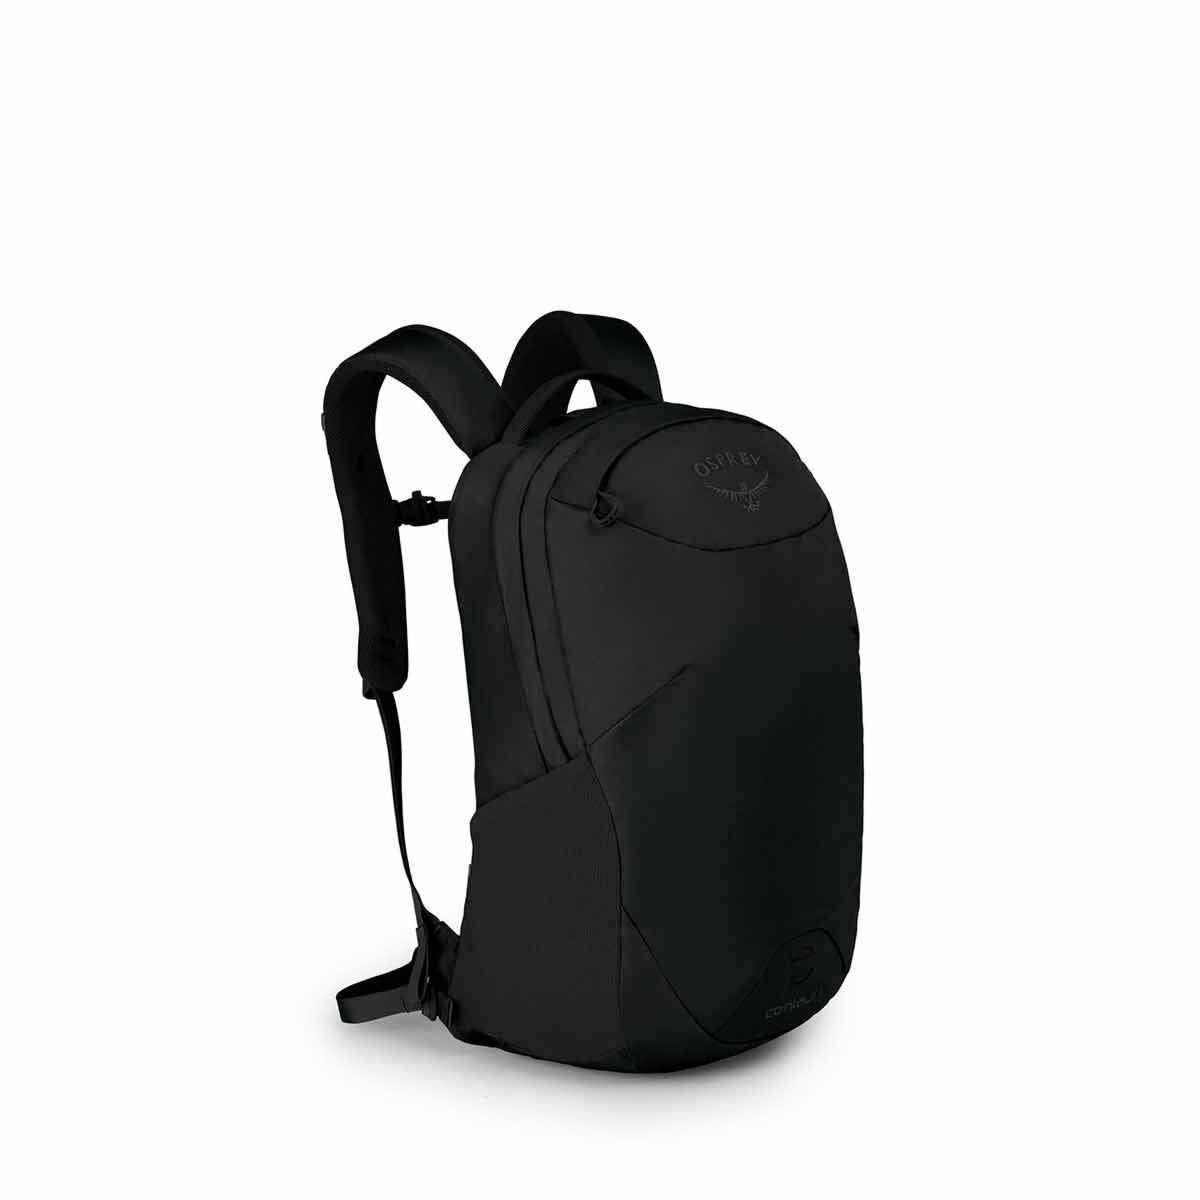 Osprey Centauri 22 Litre Backpack with Laptop Sleeve Black